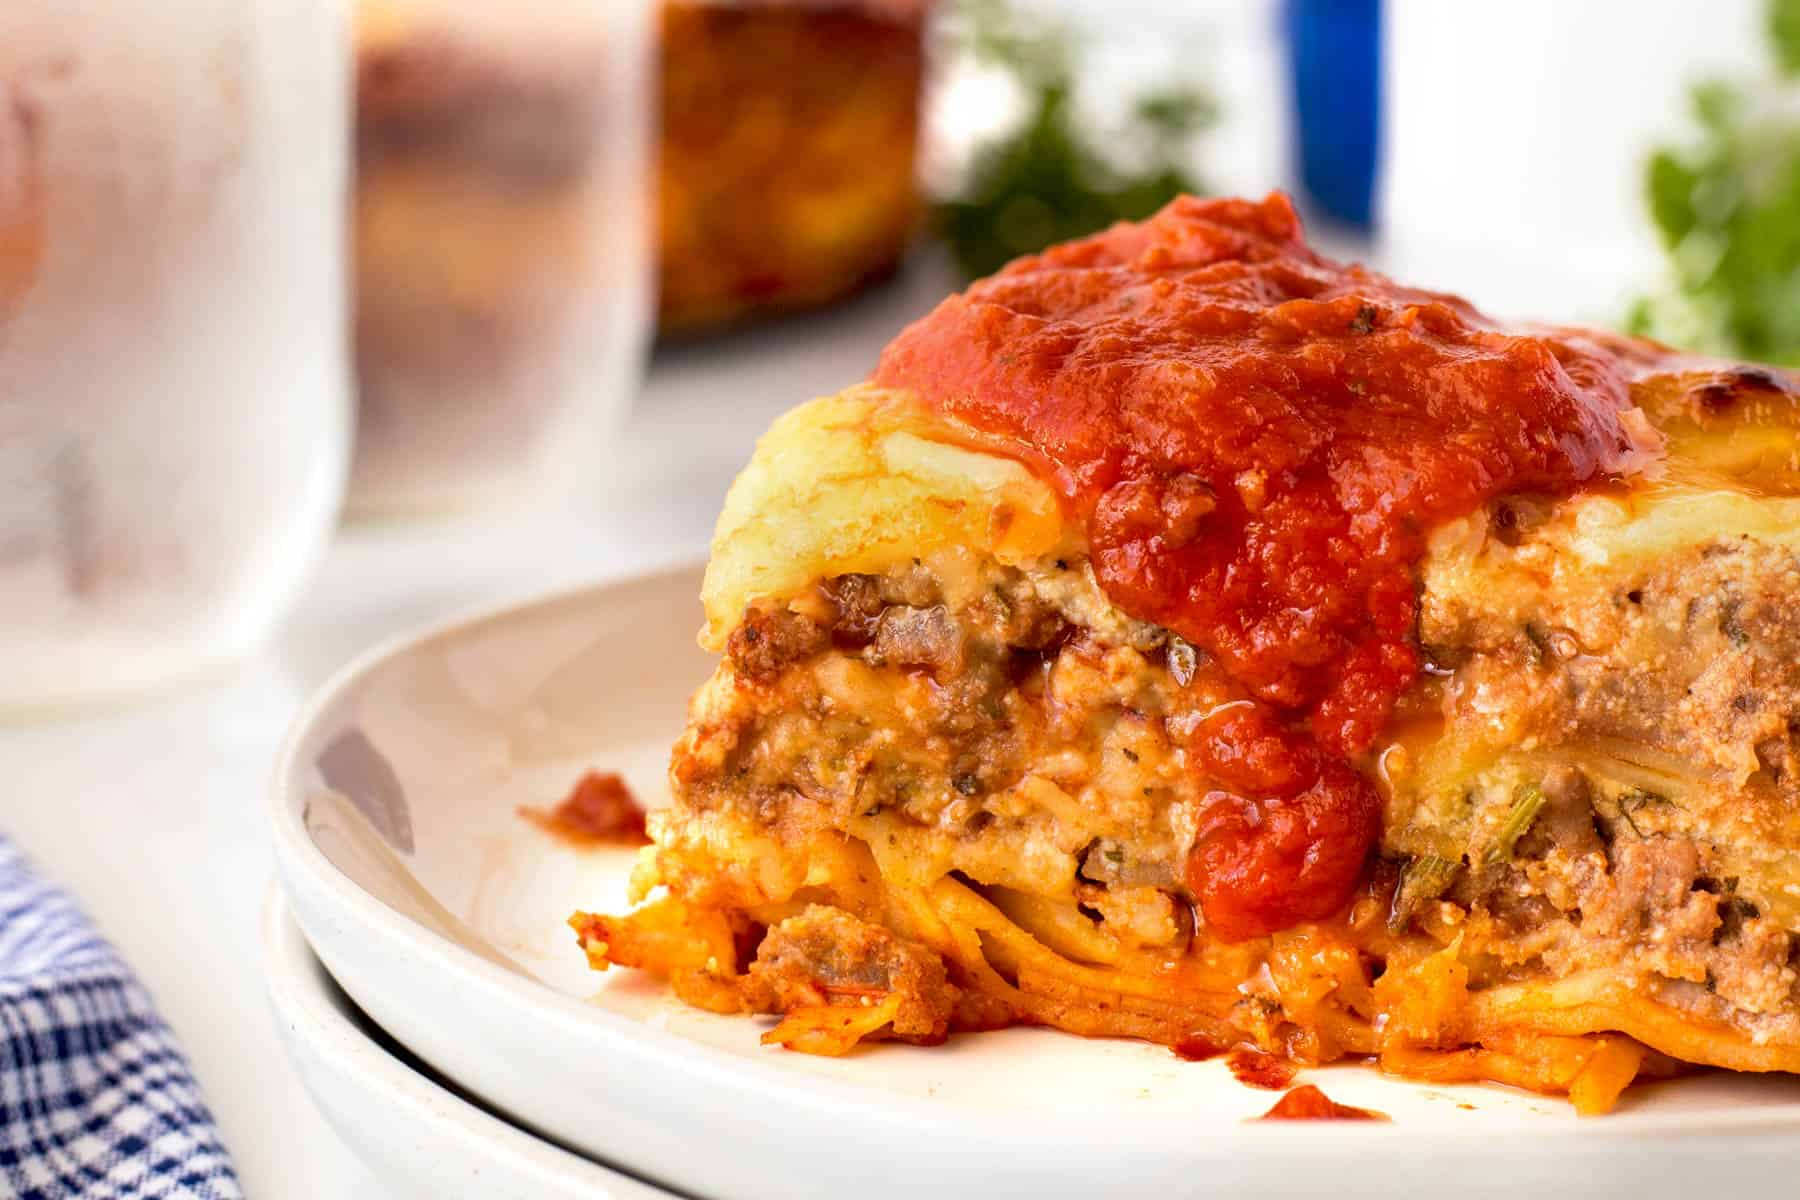 Large slice of lasagna topped with marinara sauce